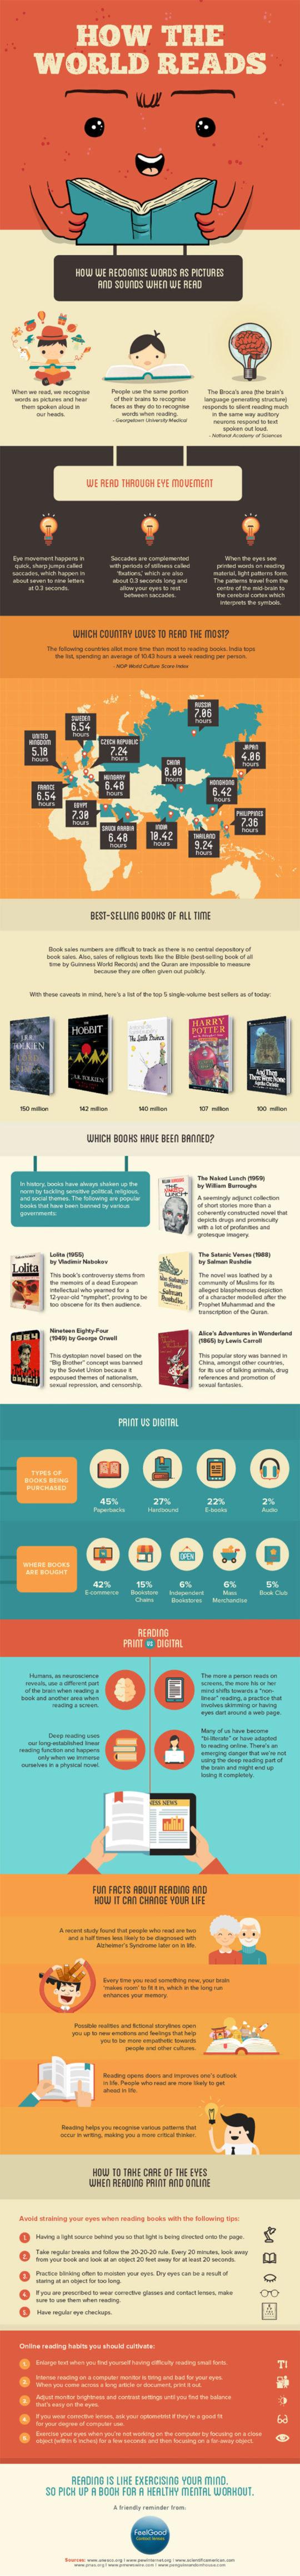 Reading around the world #infographic